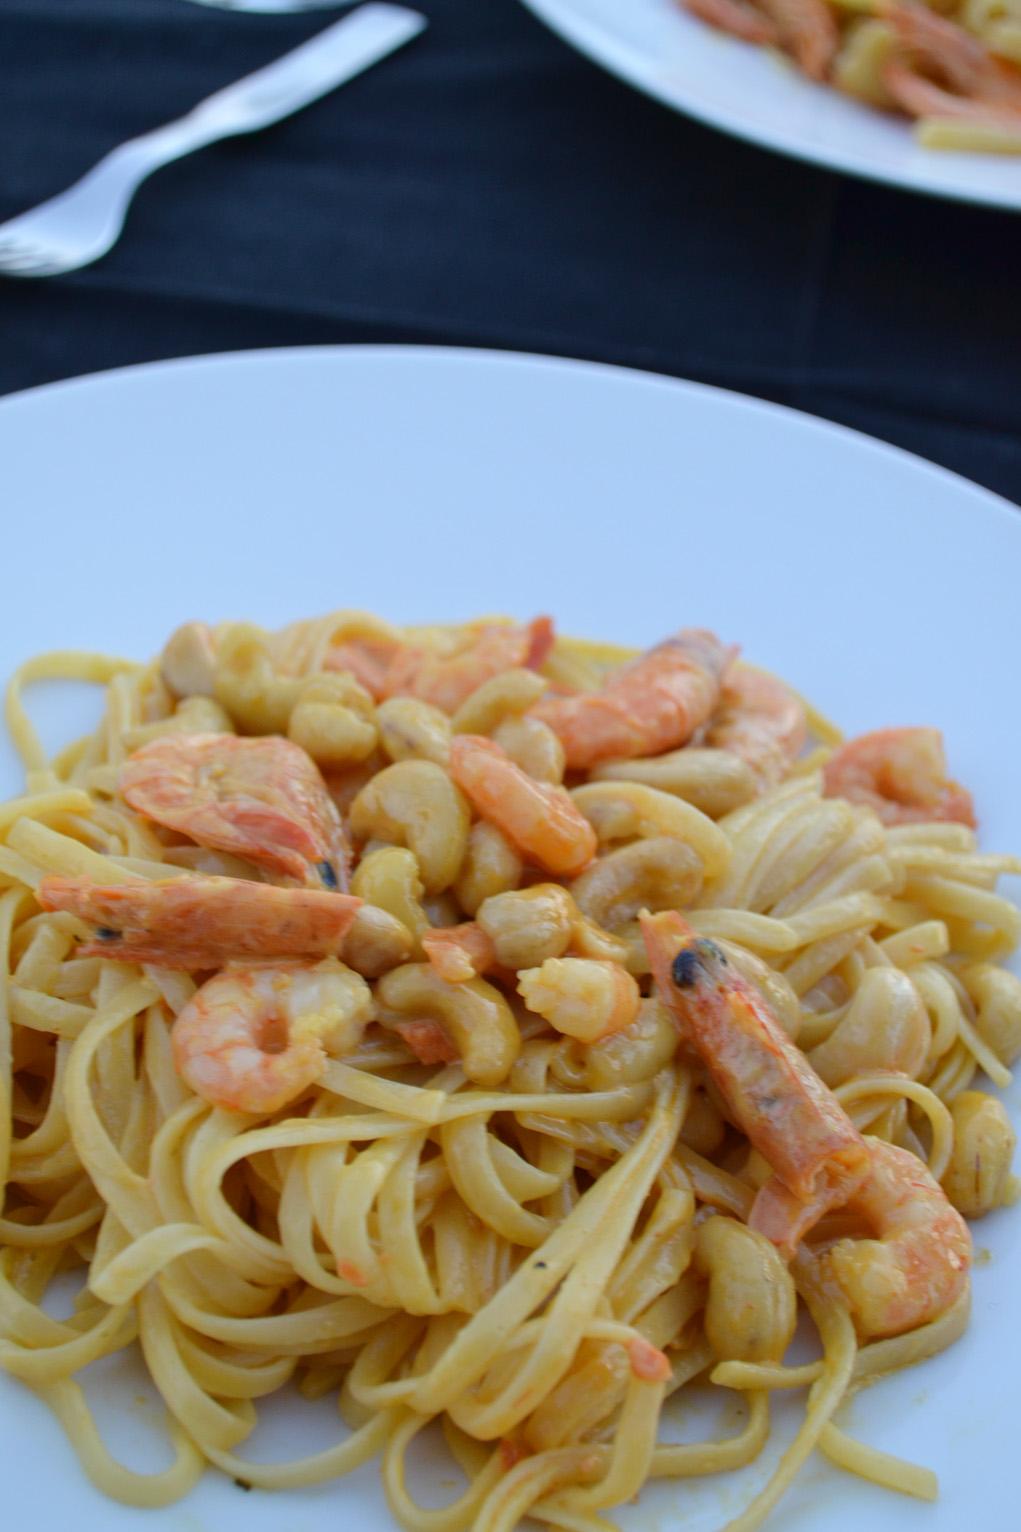 shrimp-curry-liguini-dsc_0017